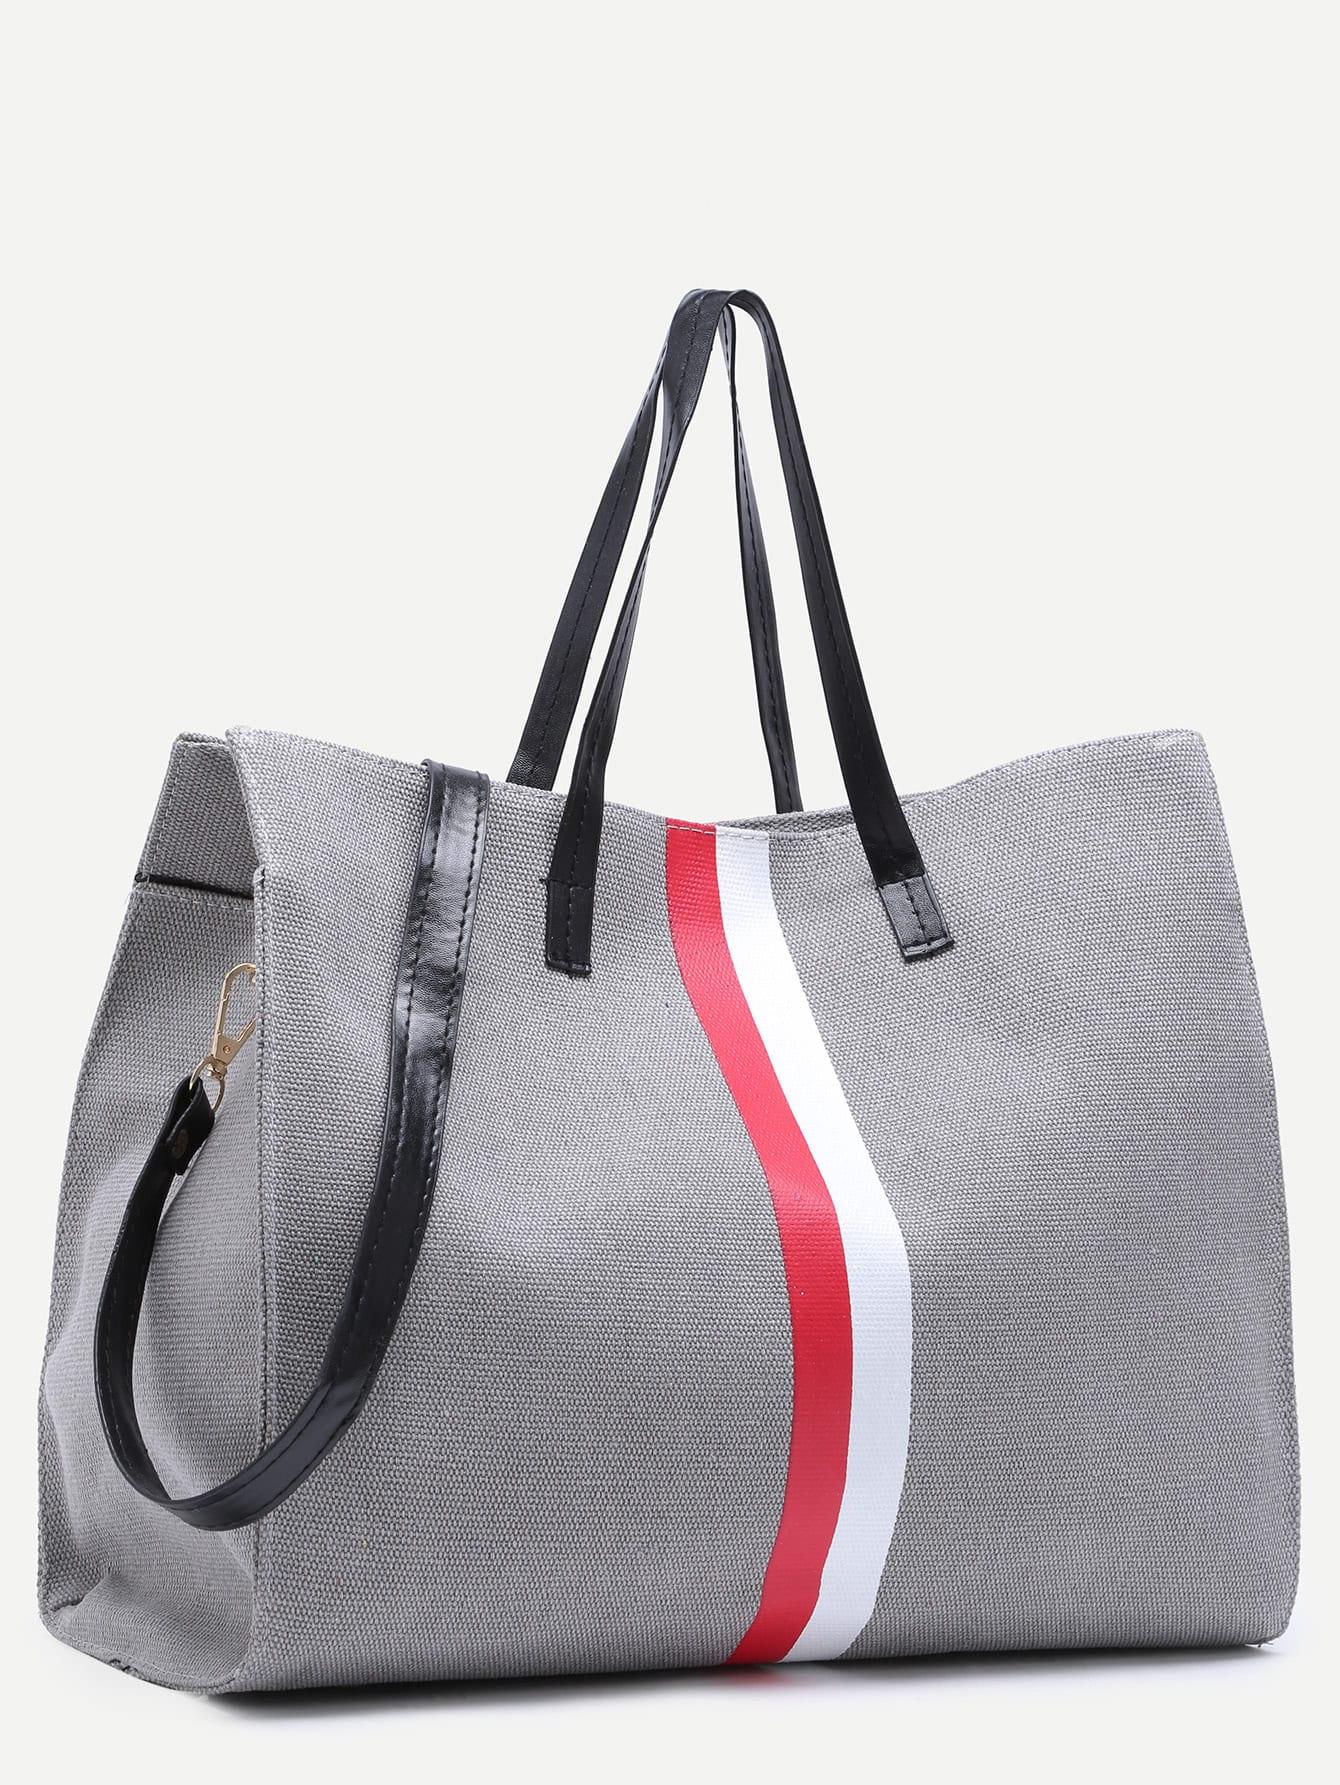 bag161025304_2